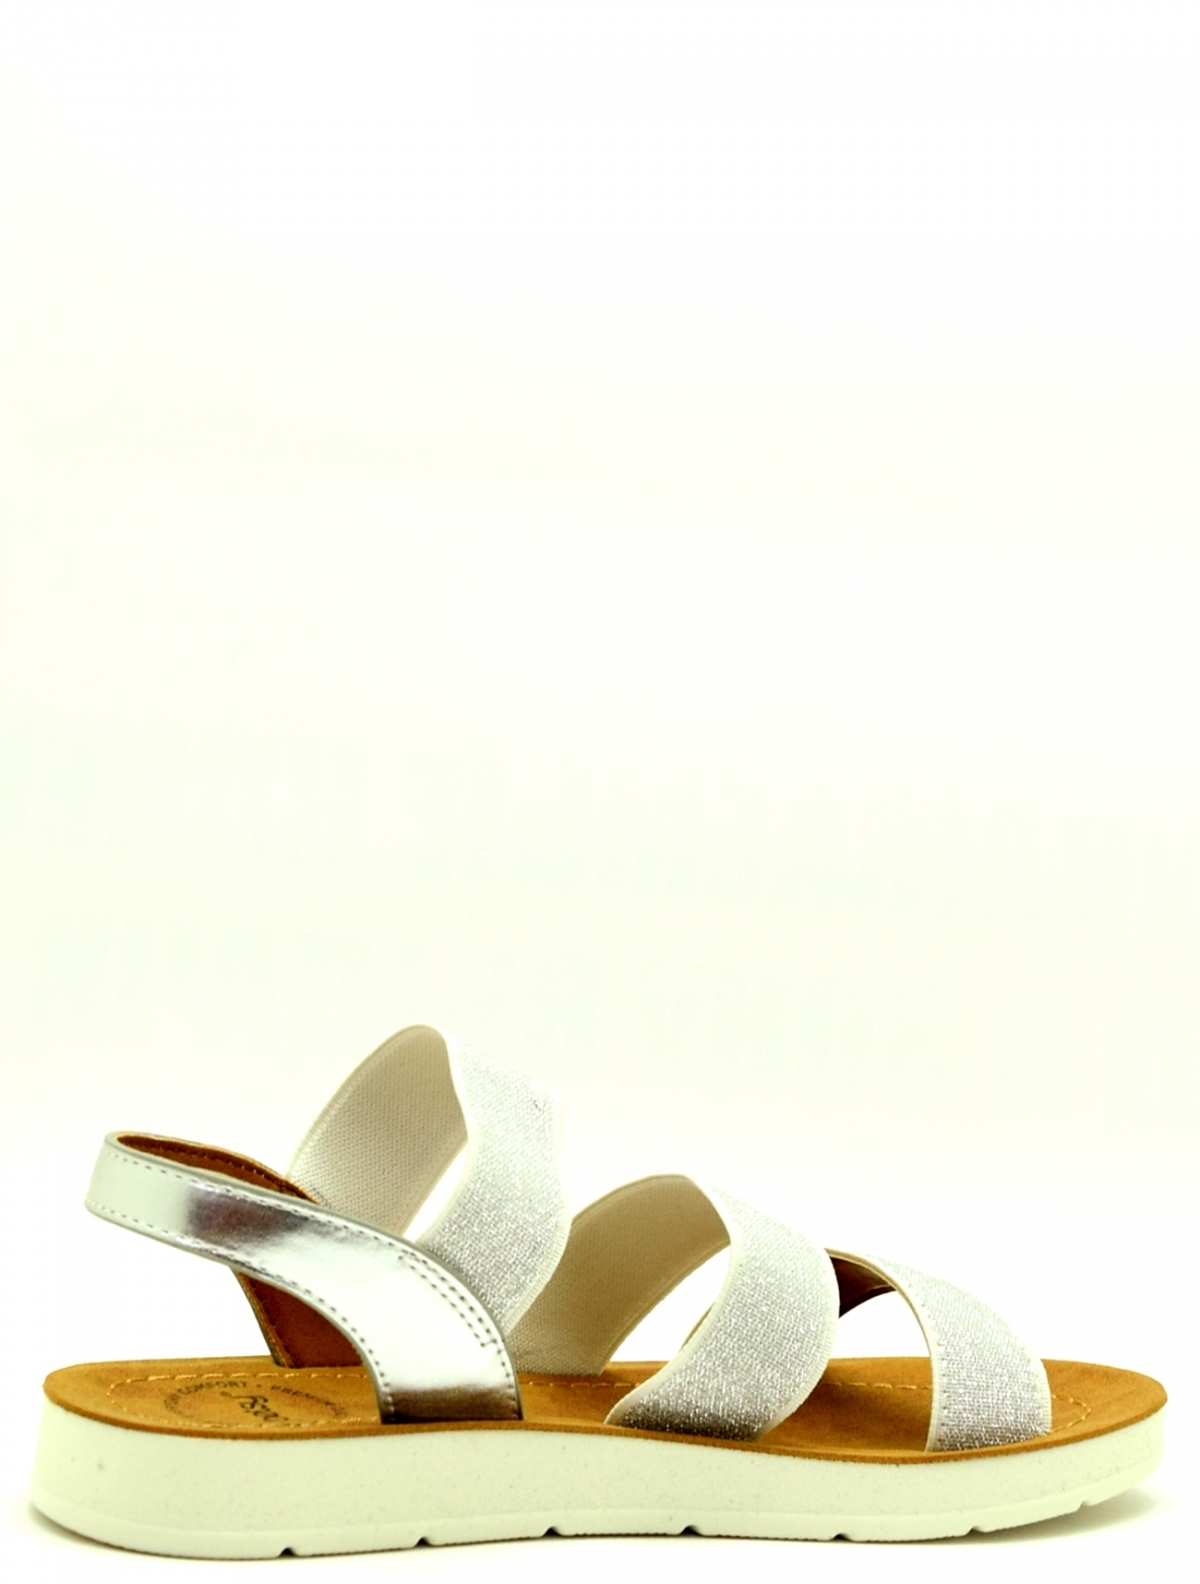 Betsy 907416/01-02 босоножки для девочки